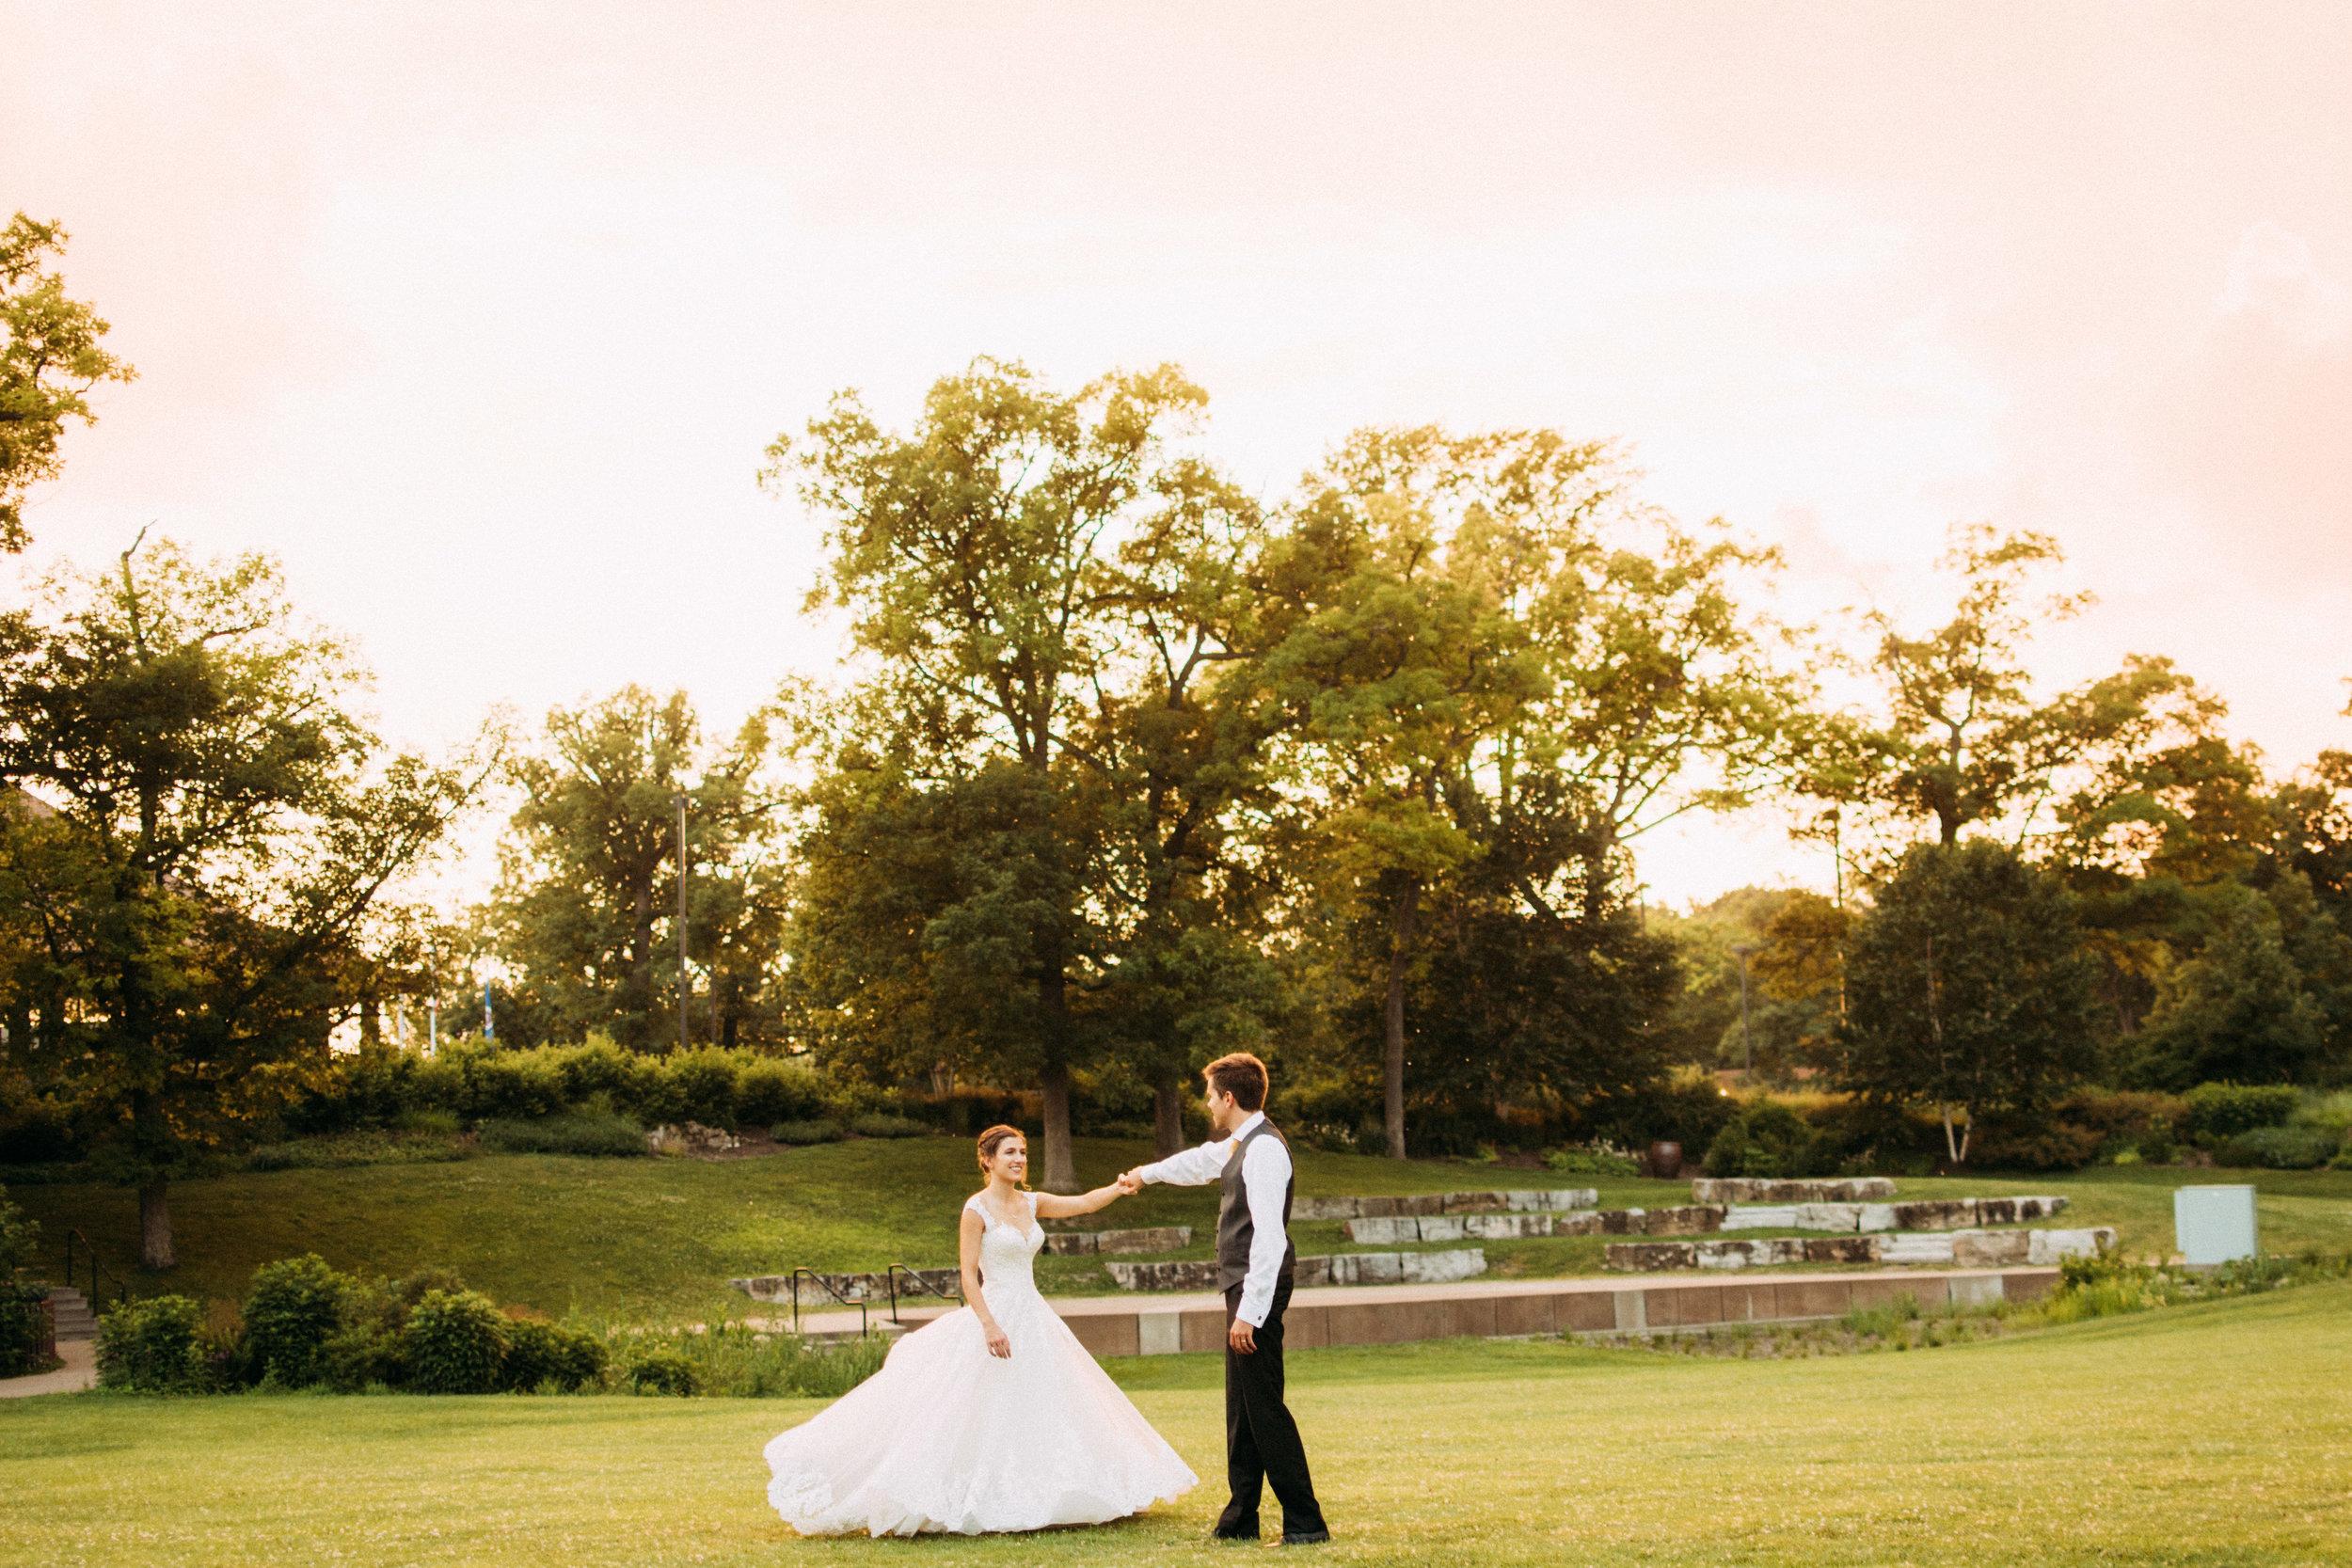 48-Liza_Chris_Minneapolis_Minnesota_Wedding.jpg